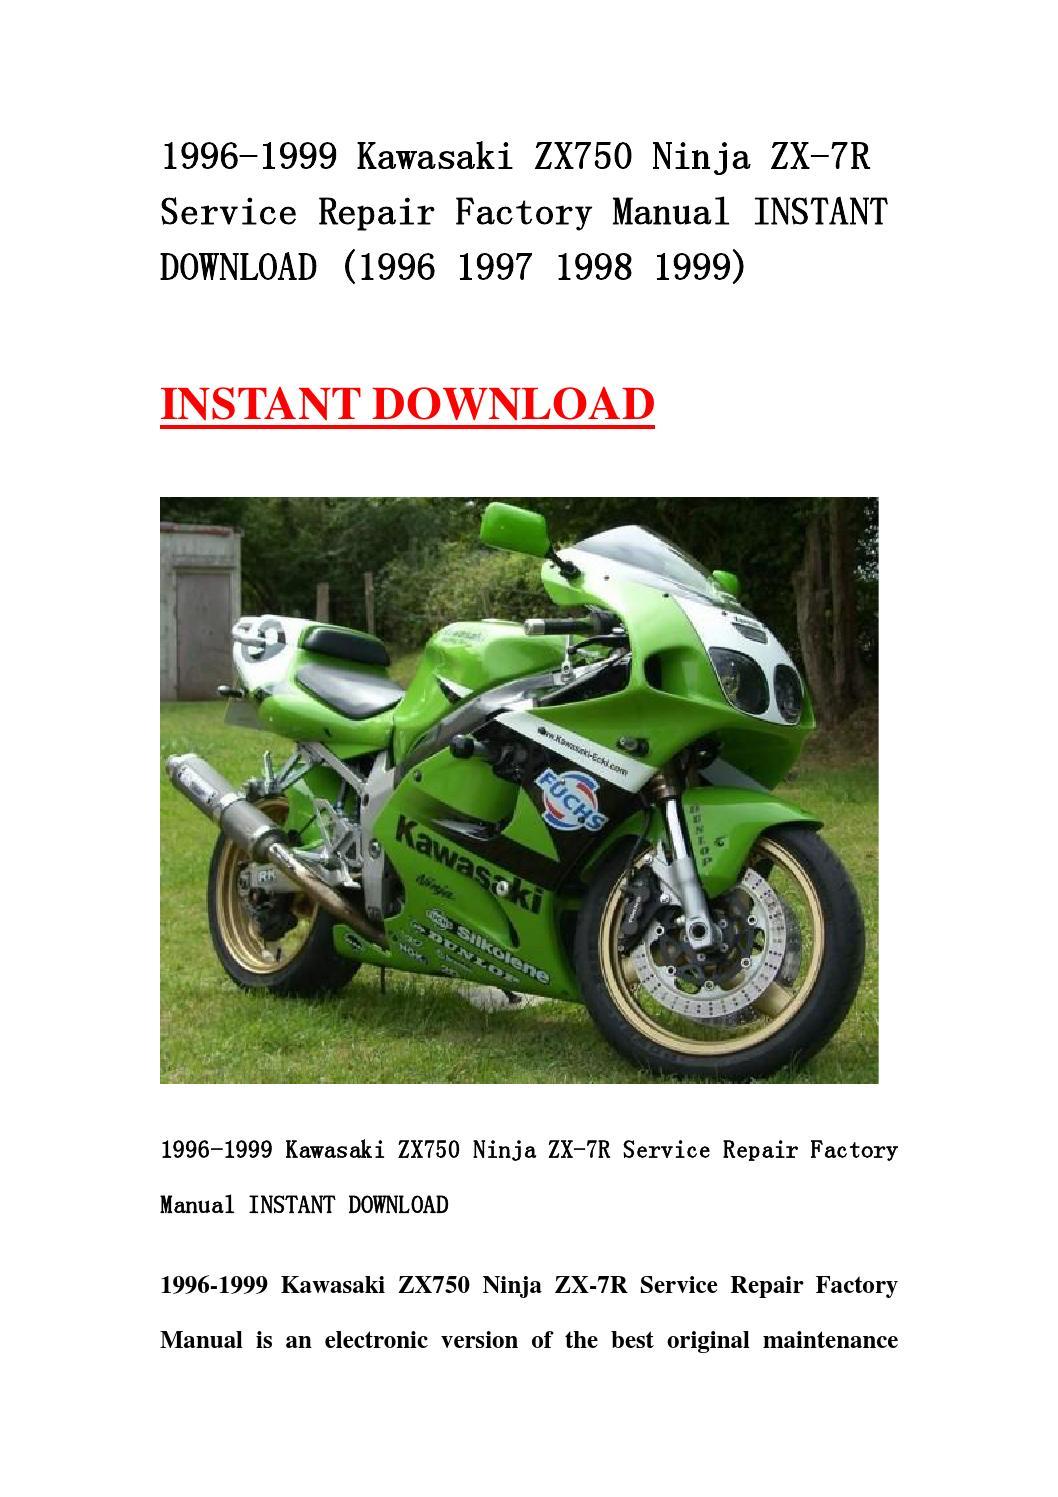 1996 1999 kawasaki zx750 ninja zx 7r service repair factory manual instant  download (1996 1997 1998 by jnshemfne - issuu